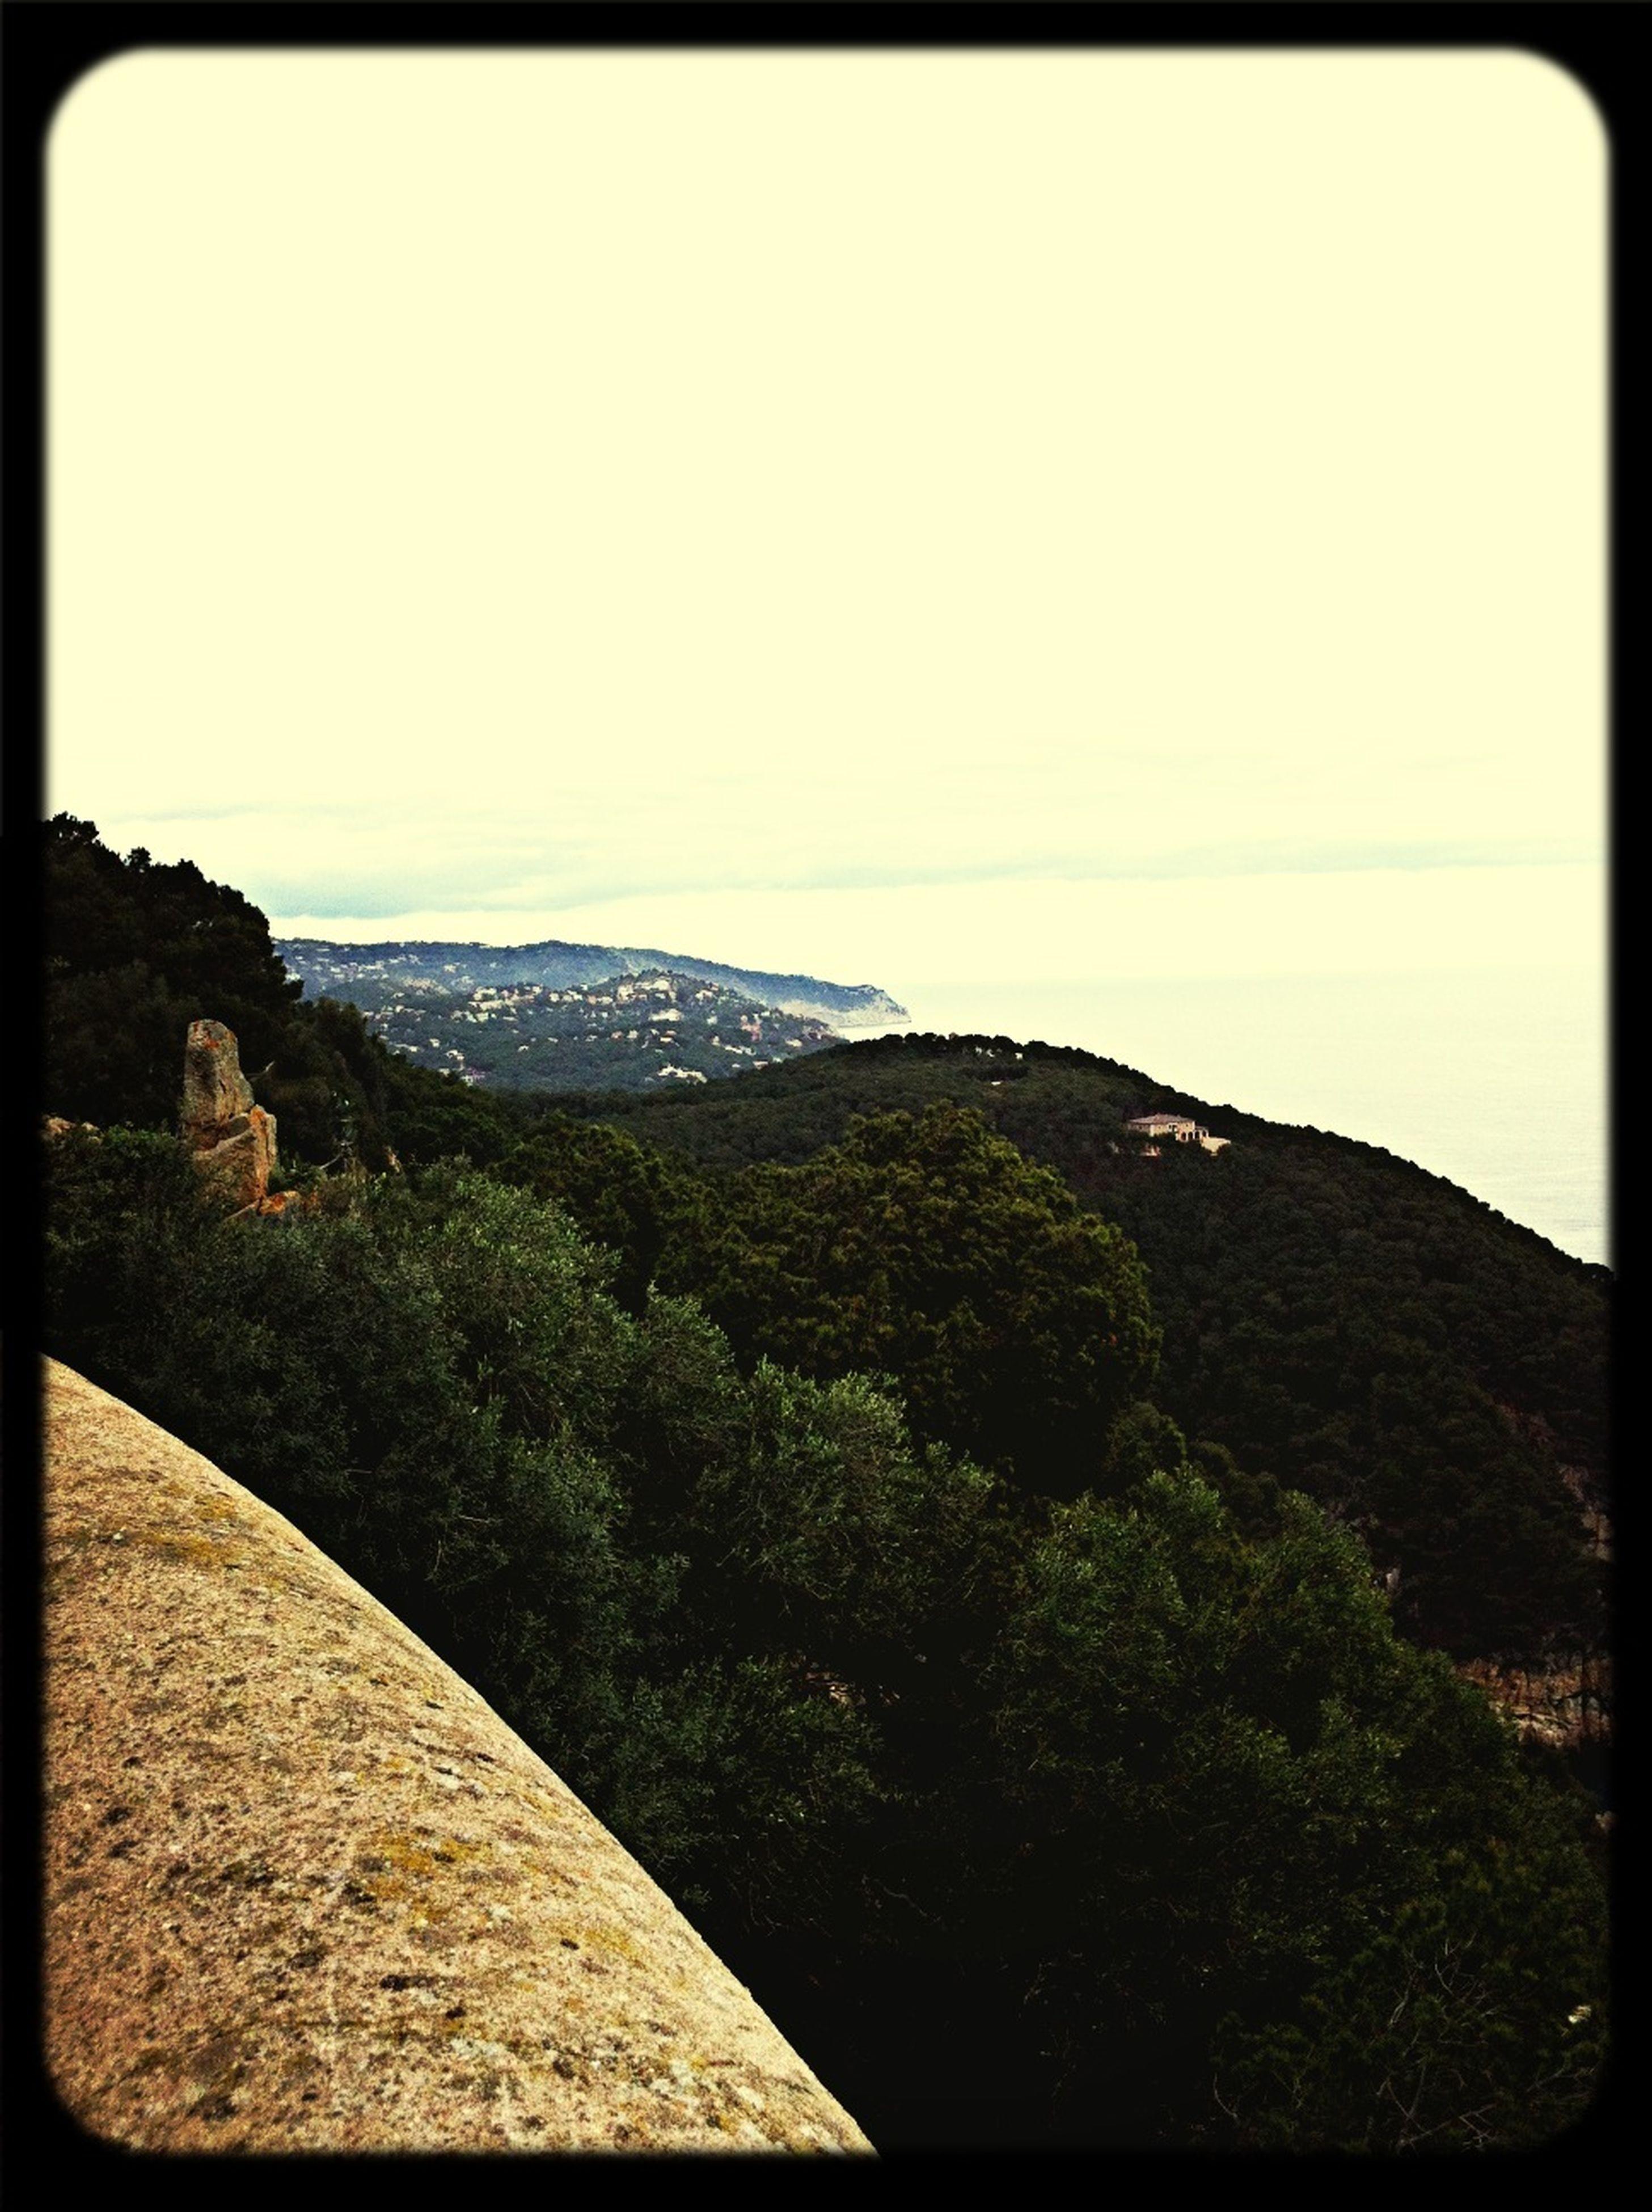 transfer print, mountain, auto post production filter, tranquil scene, tranquility, scenics, landscape, beauty in nature, clear sky, mountain range, nature, copy space, sky, non-urban scene, tree, hill, idyllic, non urban scene, remote, day